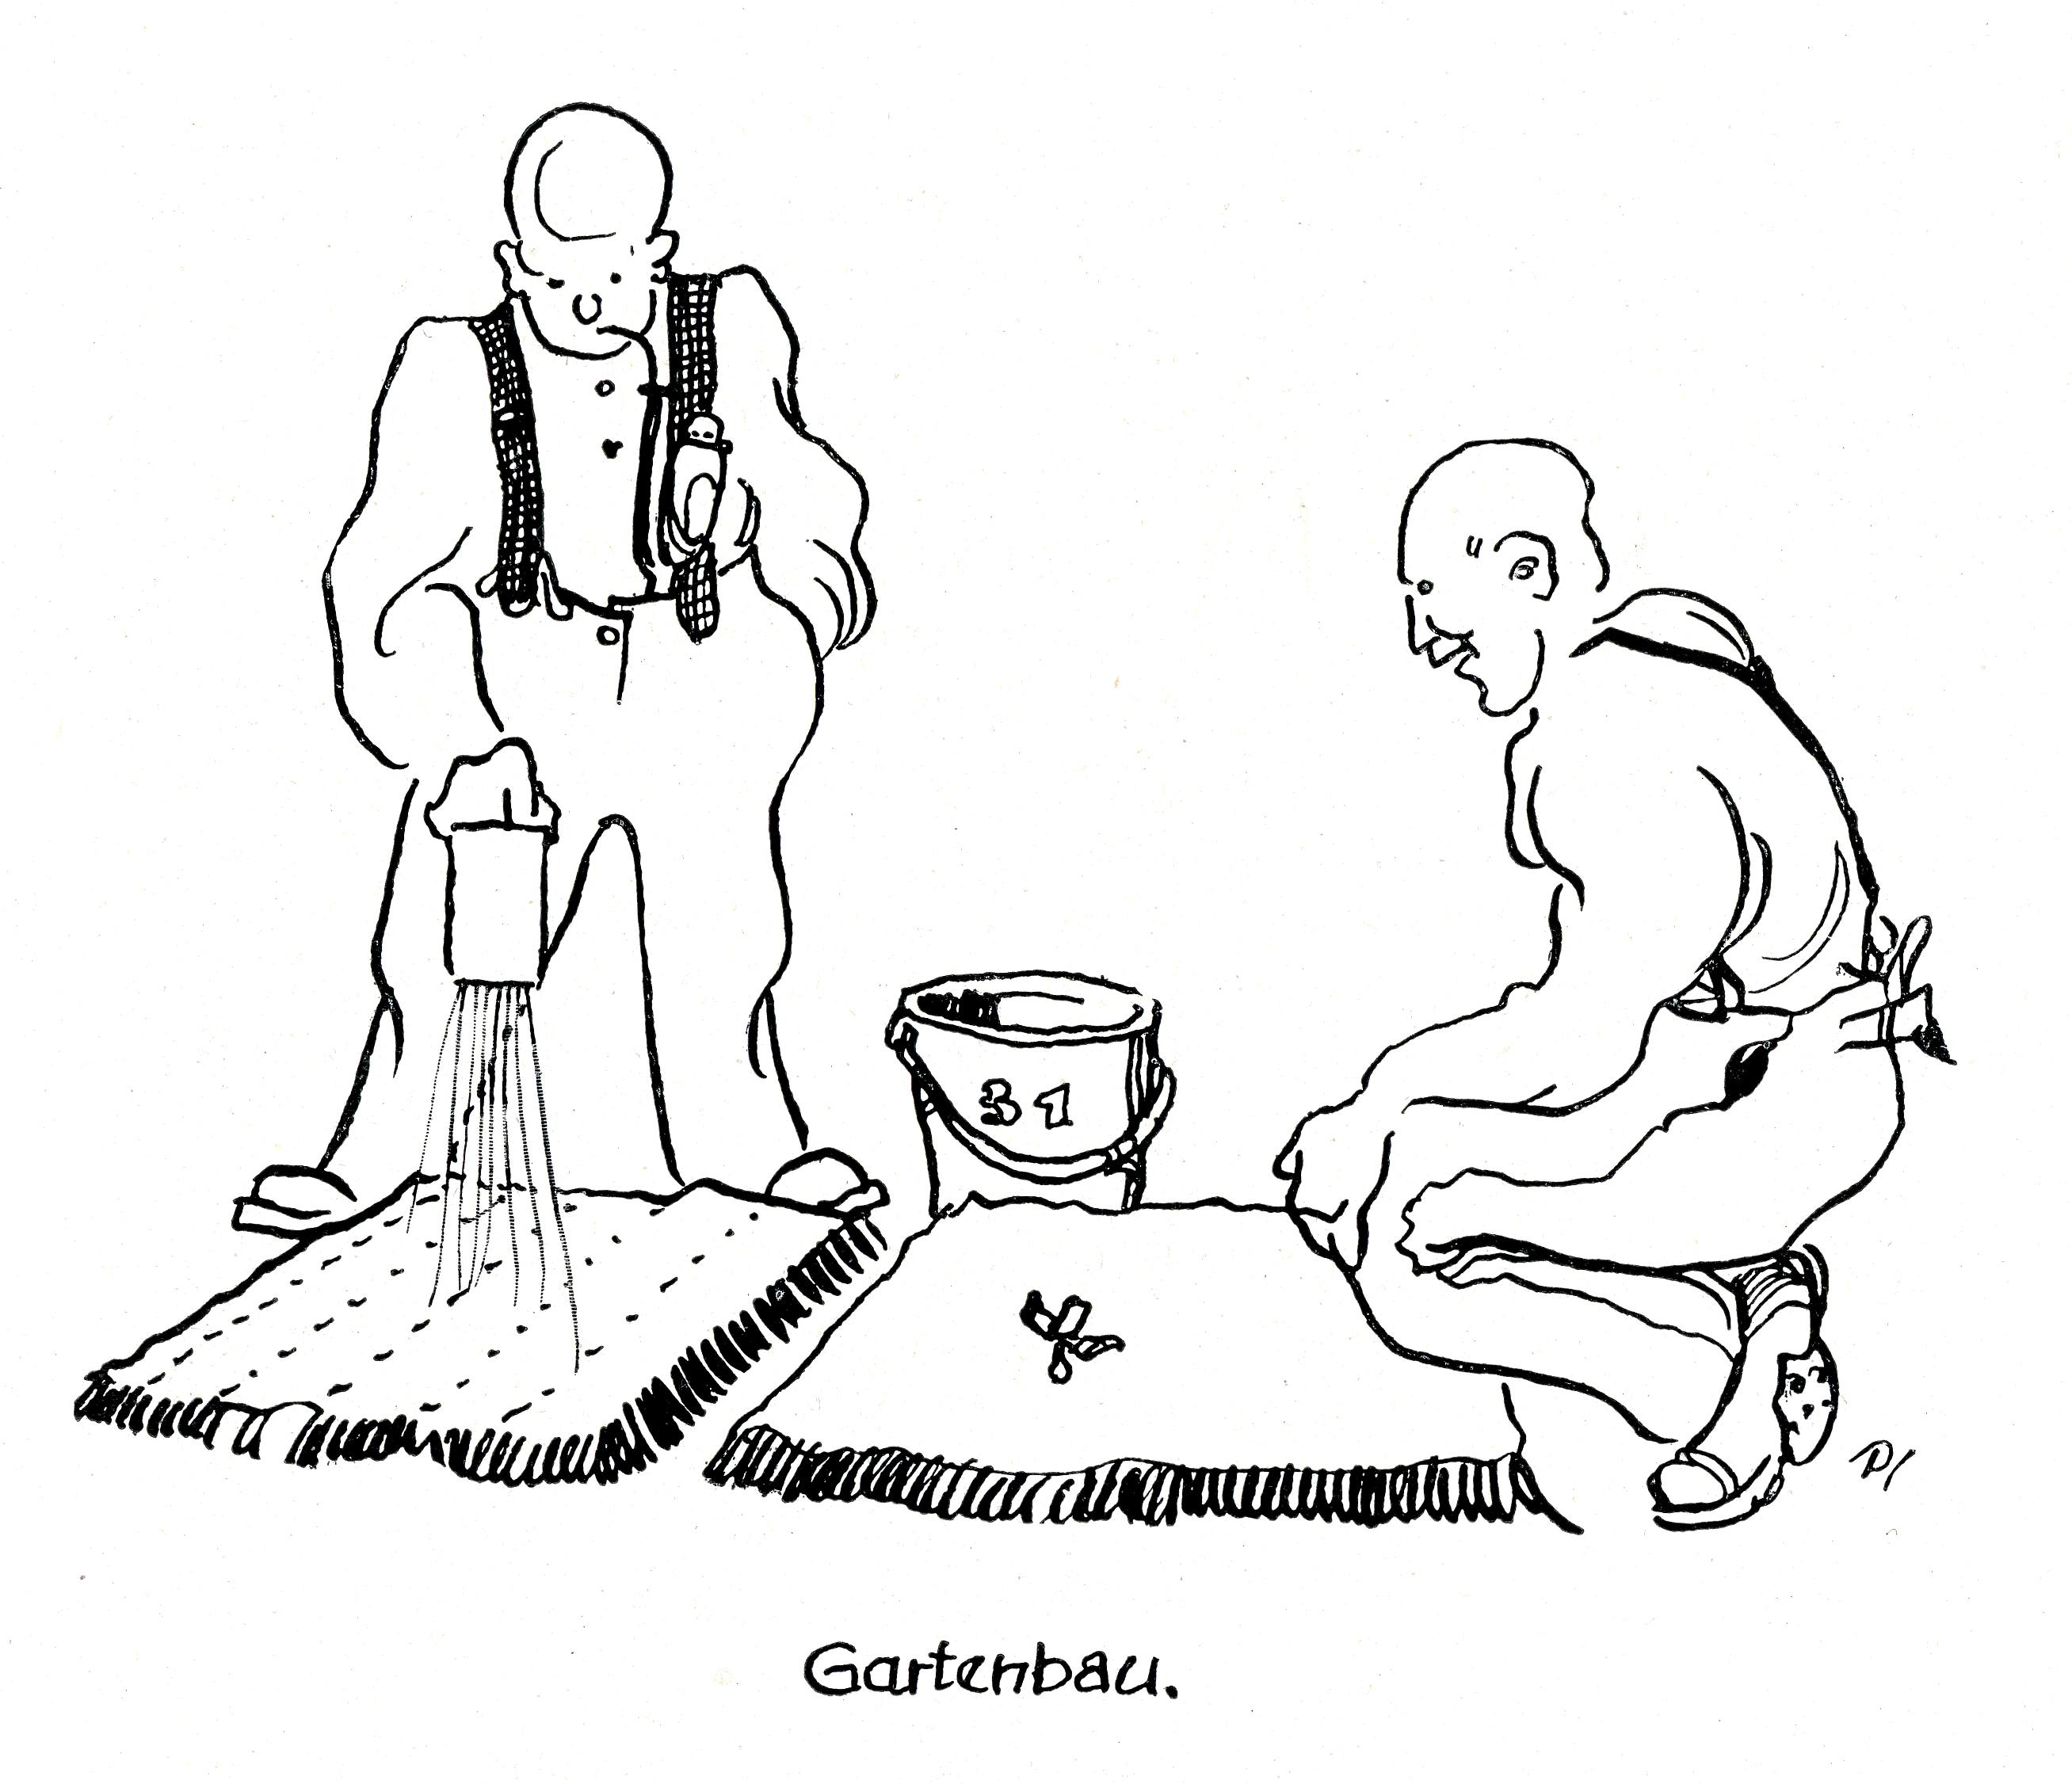 illustration of two prisoners growing vegetables